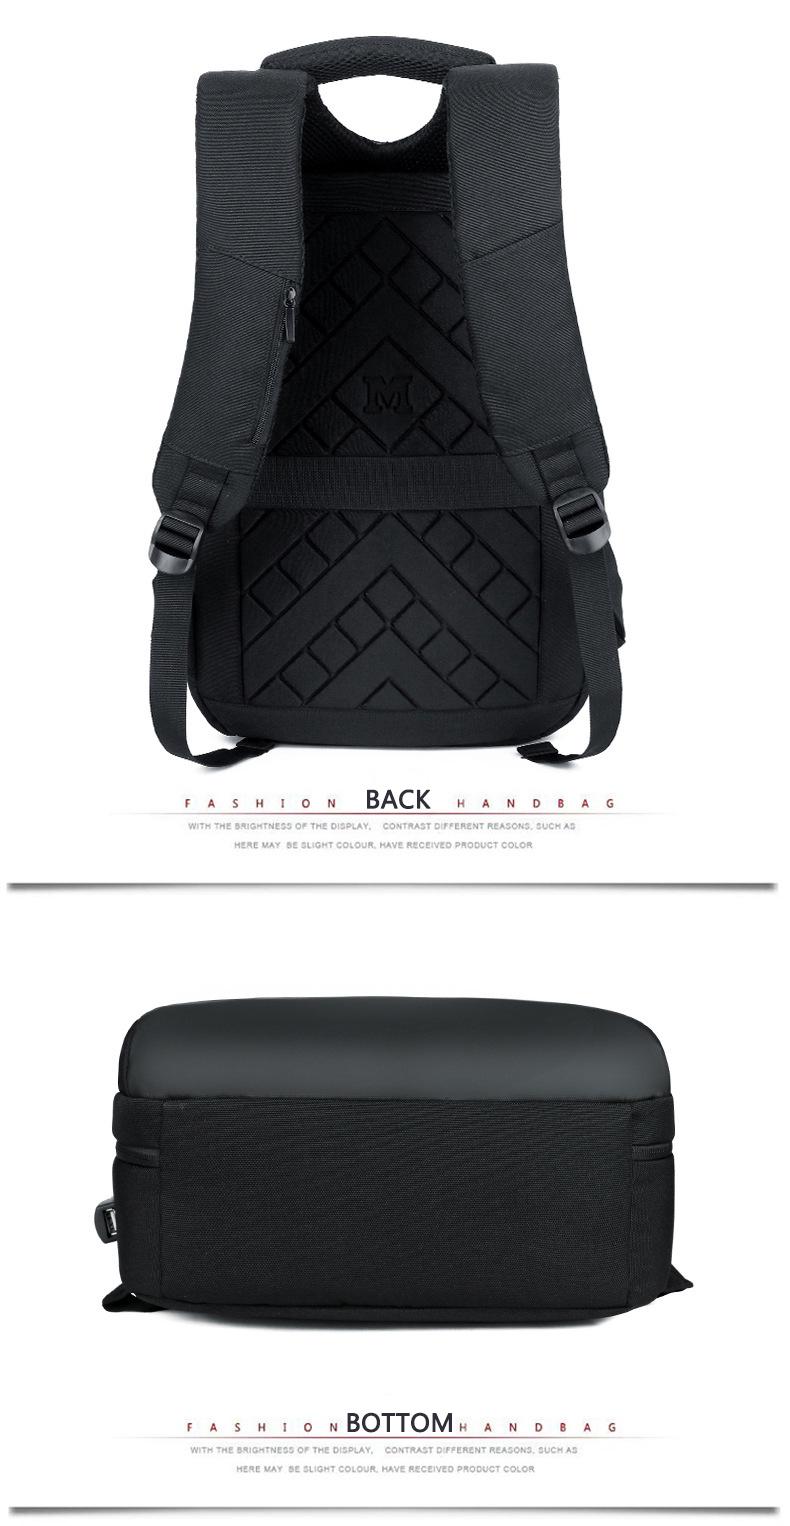 HTB19hgRXPvuK1Rjy0Faq6x2aVXae - Mens 15.6 inch Laptop Business Backpacks Waterproof Male Travel